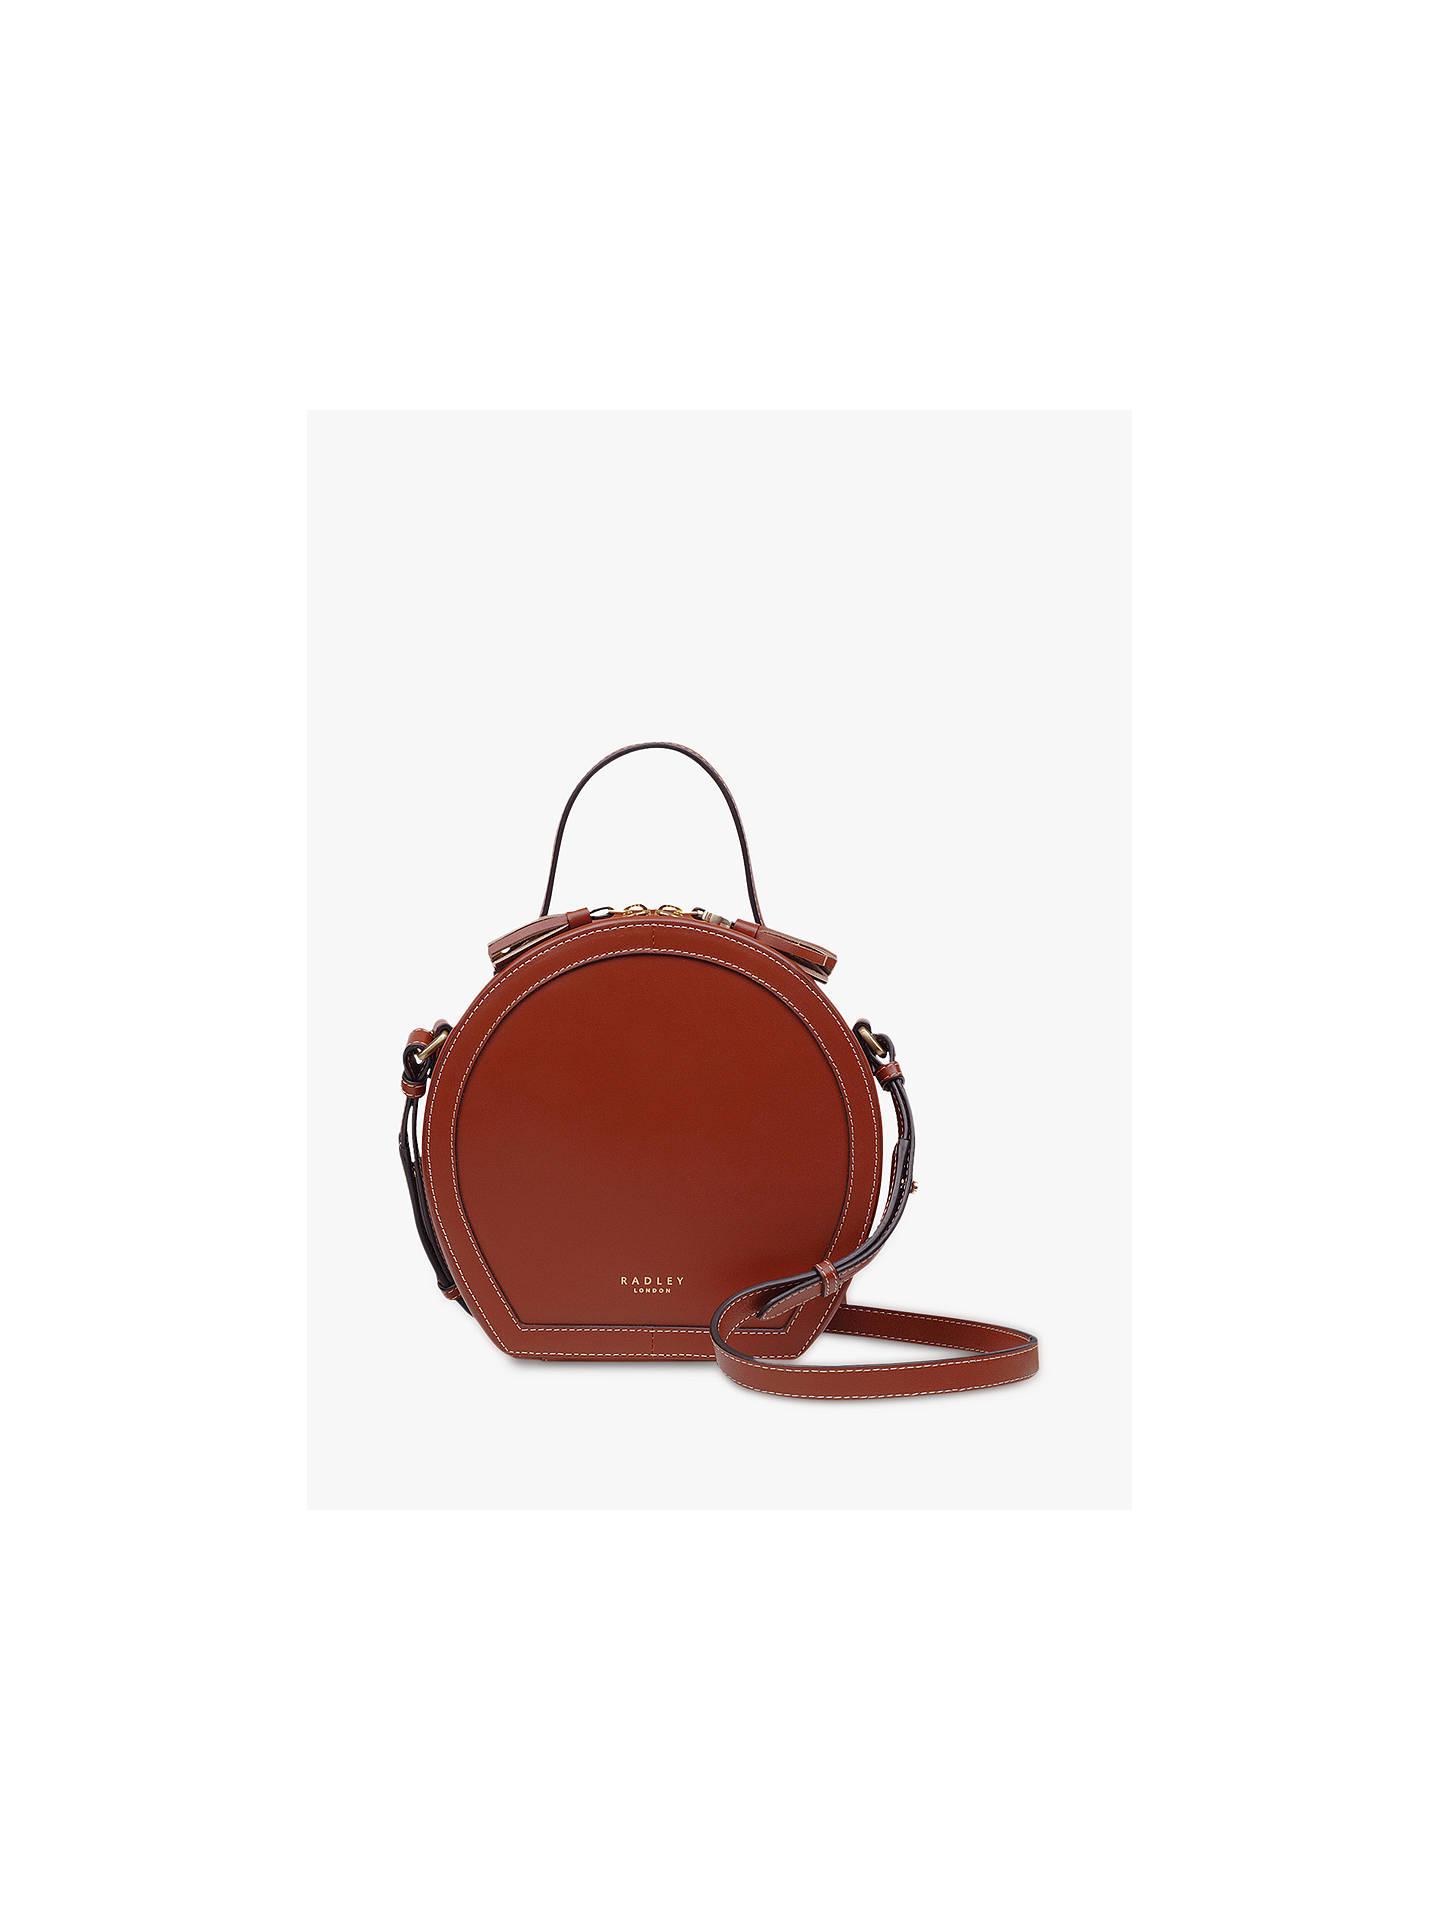 rock-bottom price big clearance sale how to orders Radley Hazel Leather Grab Bag, Brown